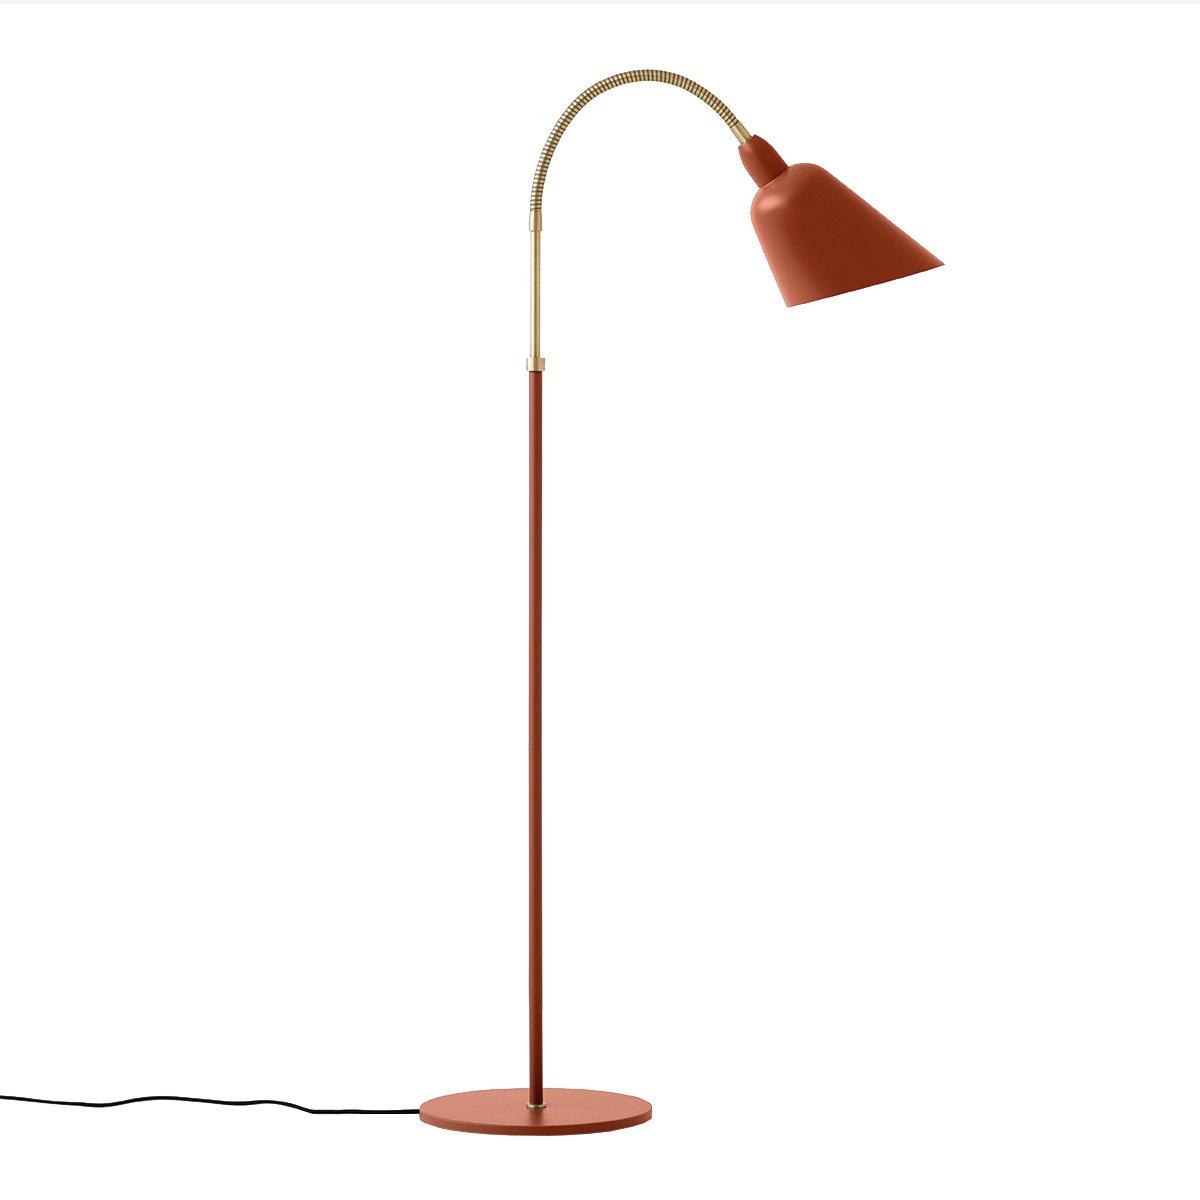 &Tradition Bellevue AJ7 Vloerlamp - Copper Brown / Messing